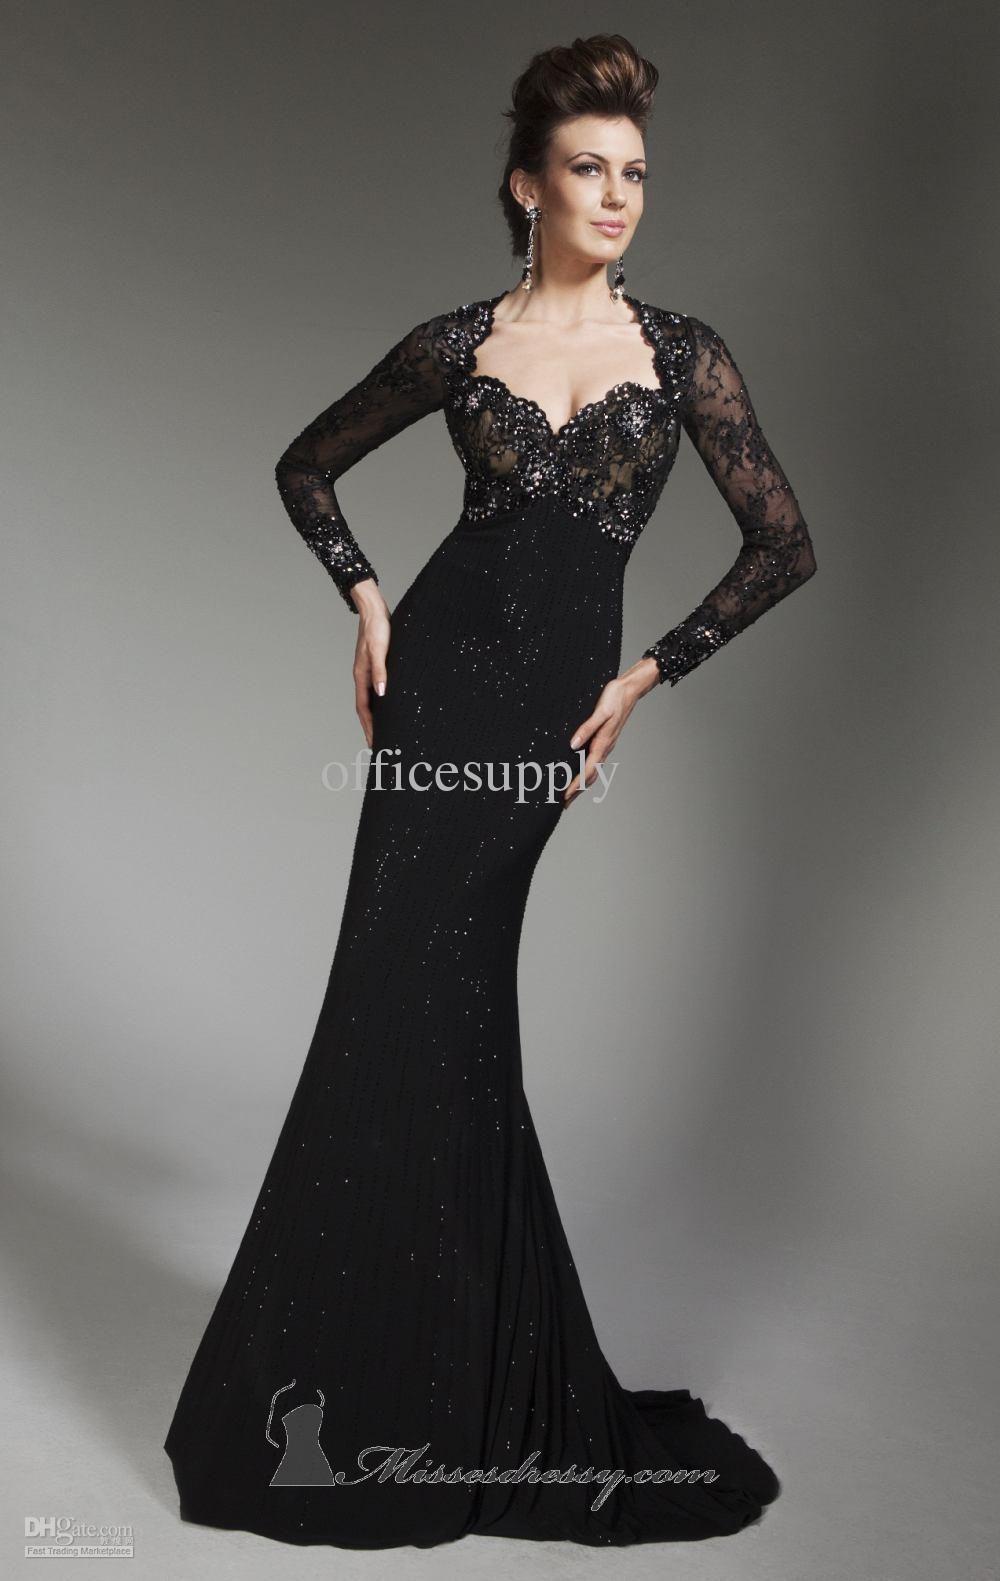 ad4ef4bbbe254 Buy Evening Dress Near Me - PostParc